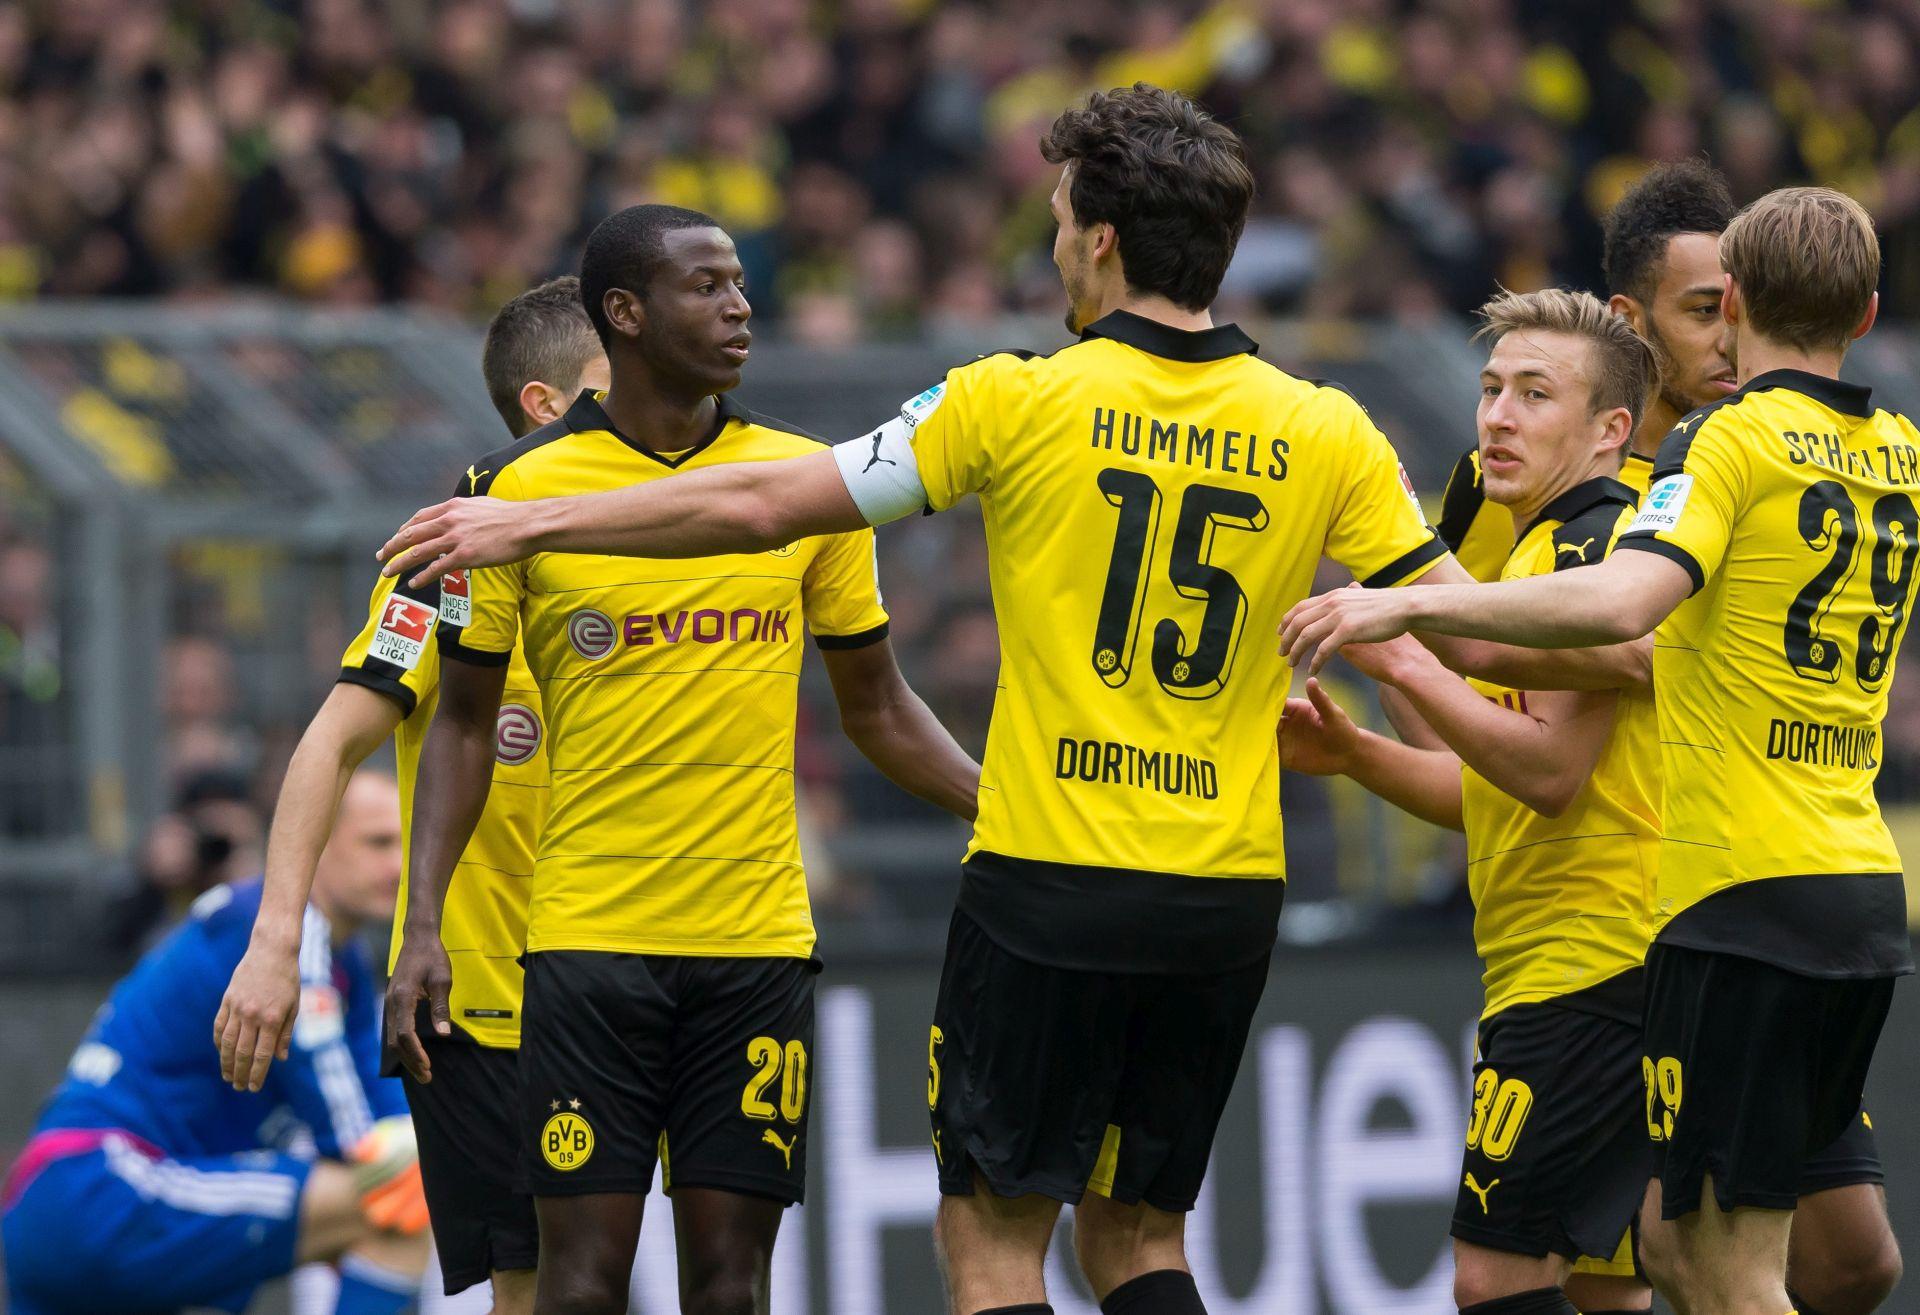 Njemačka: Borussia D. – Hamburger SV 3-0